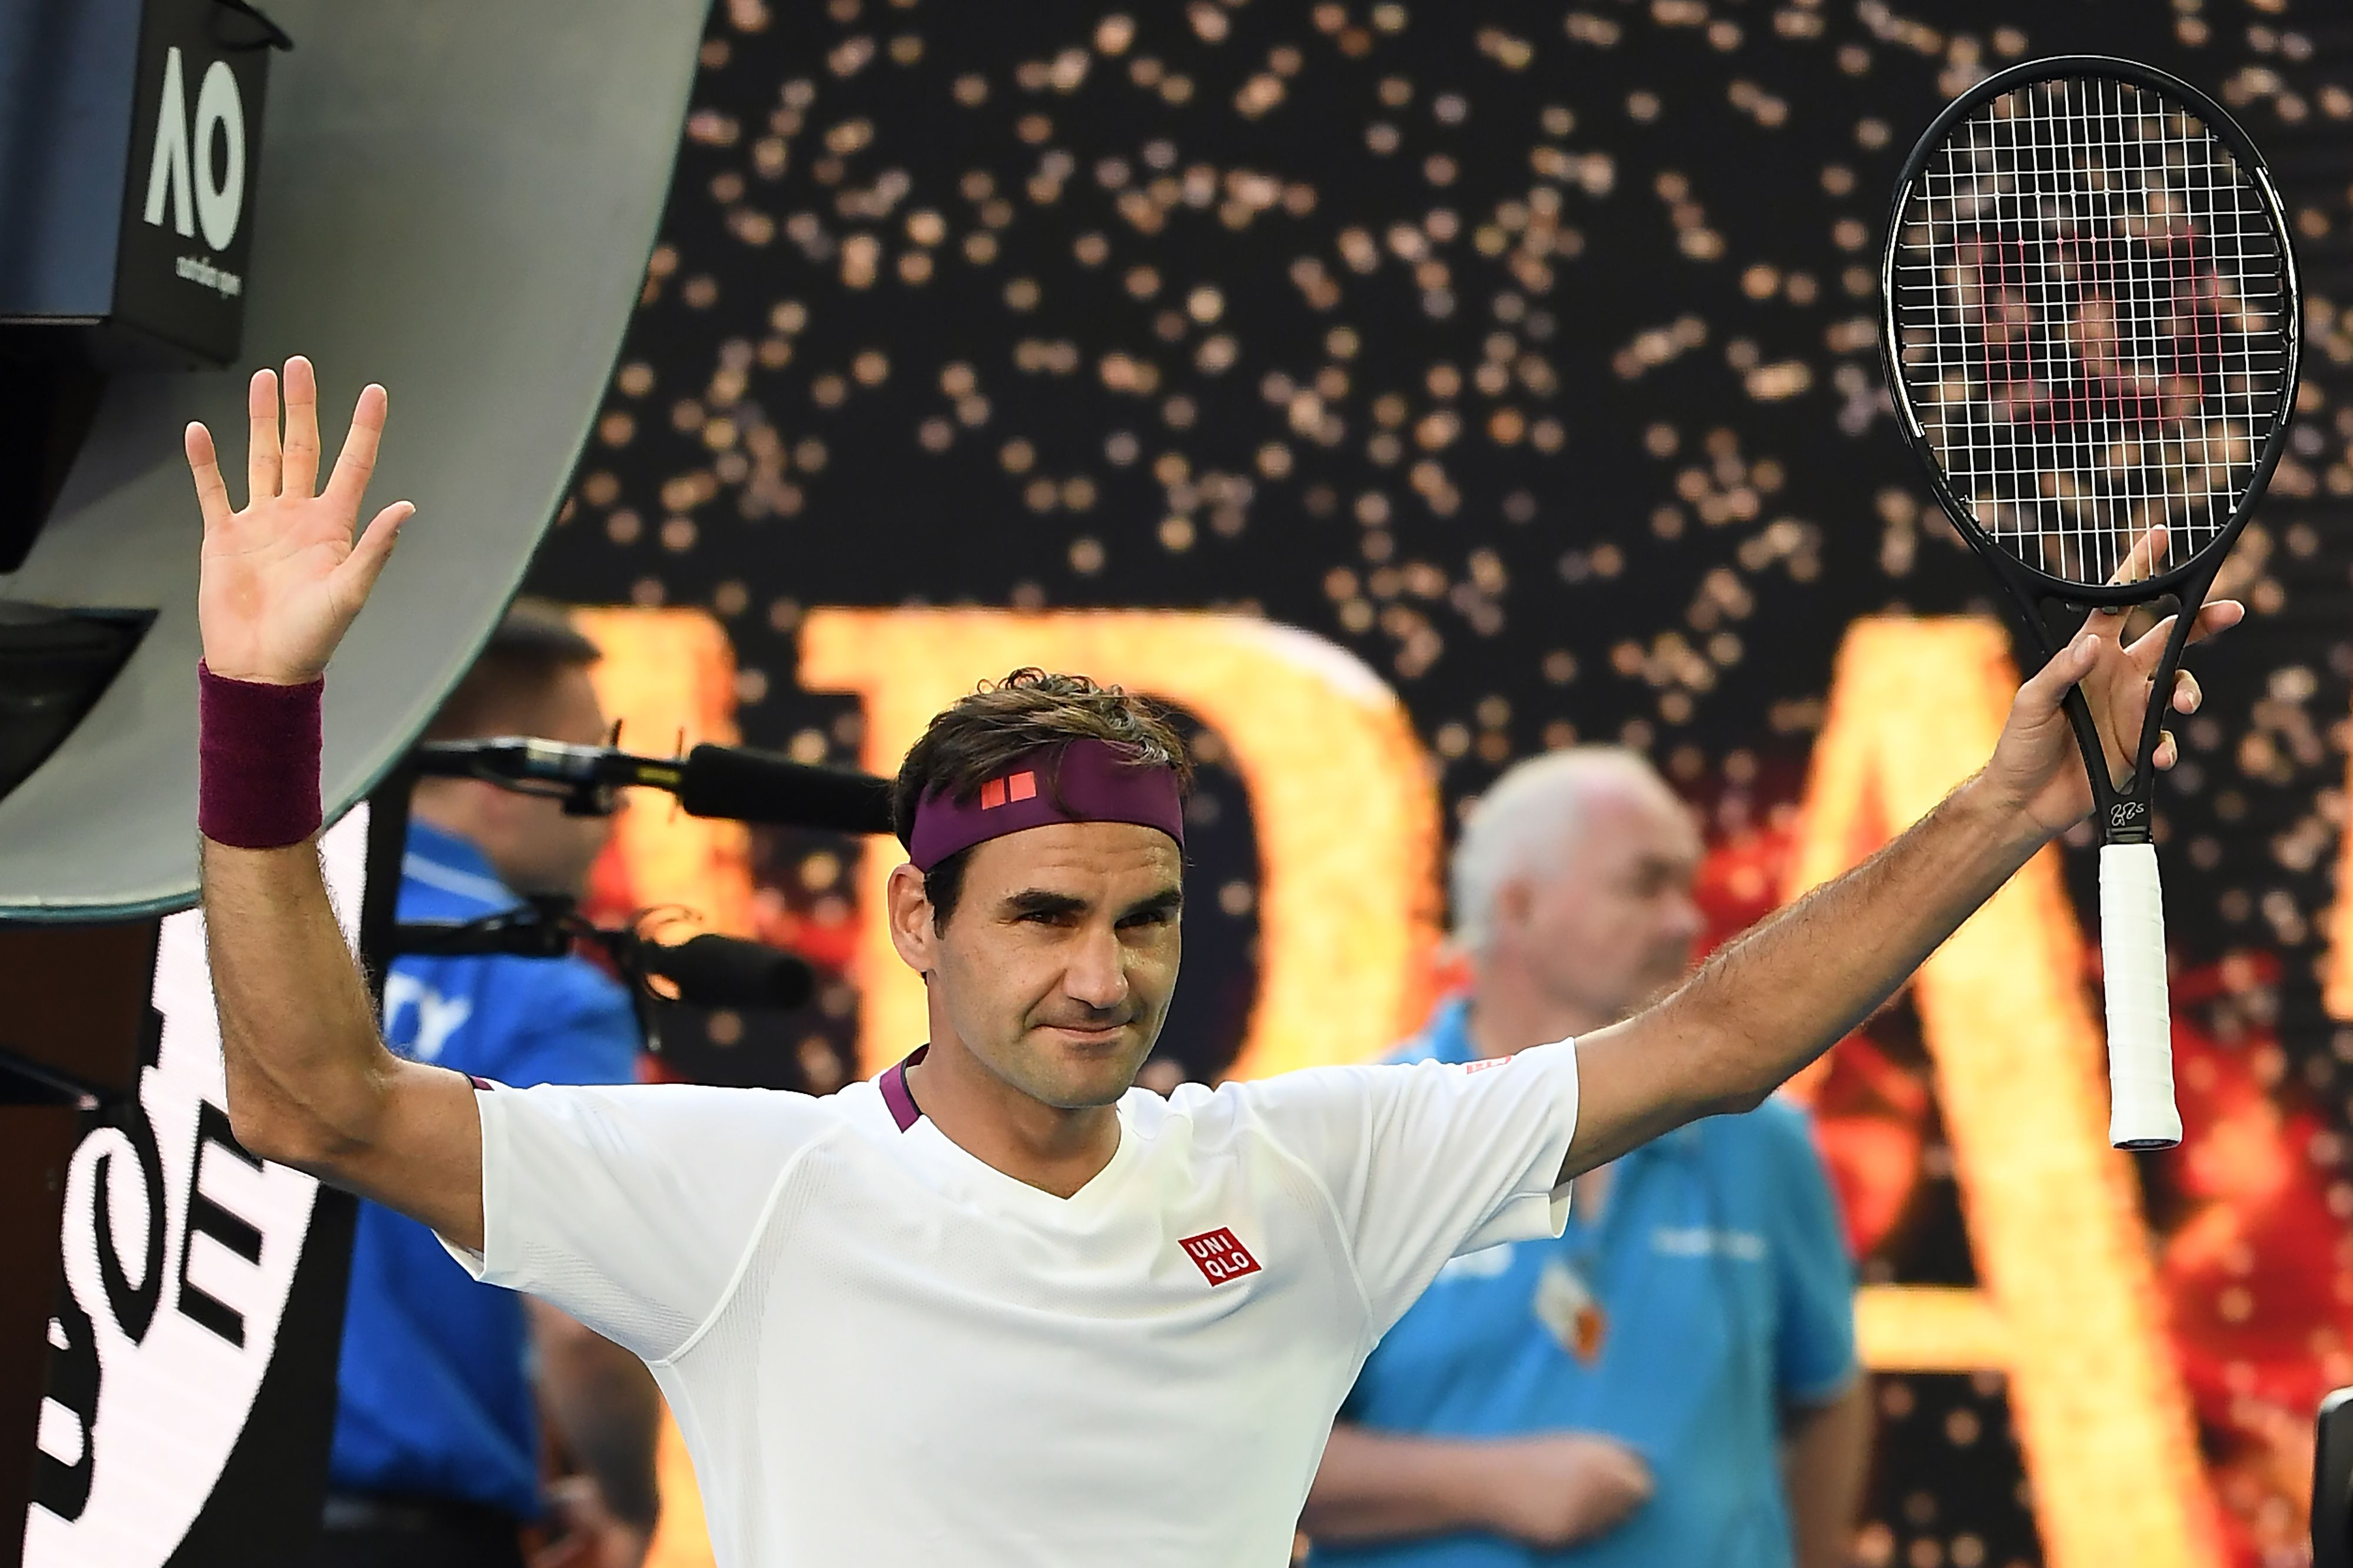 Roger Federer saves seven match points against Tennys Sandgren to reach Australian Open semifinals